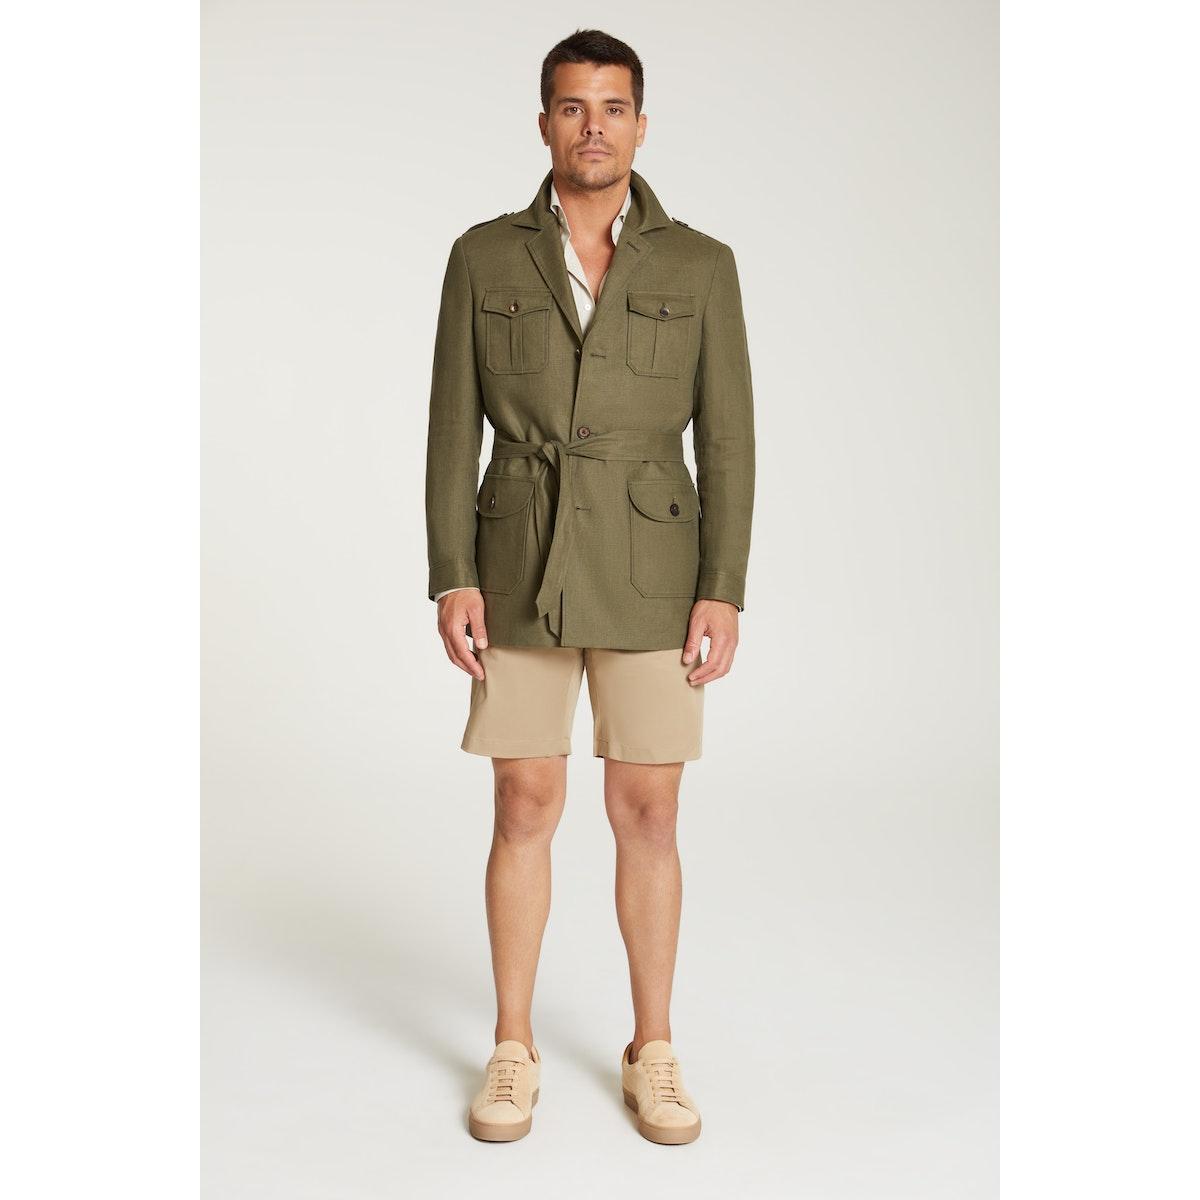 InStitchu Collection The Sahara Kahki Linen Safari Jacket